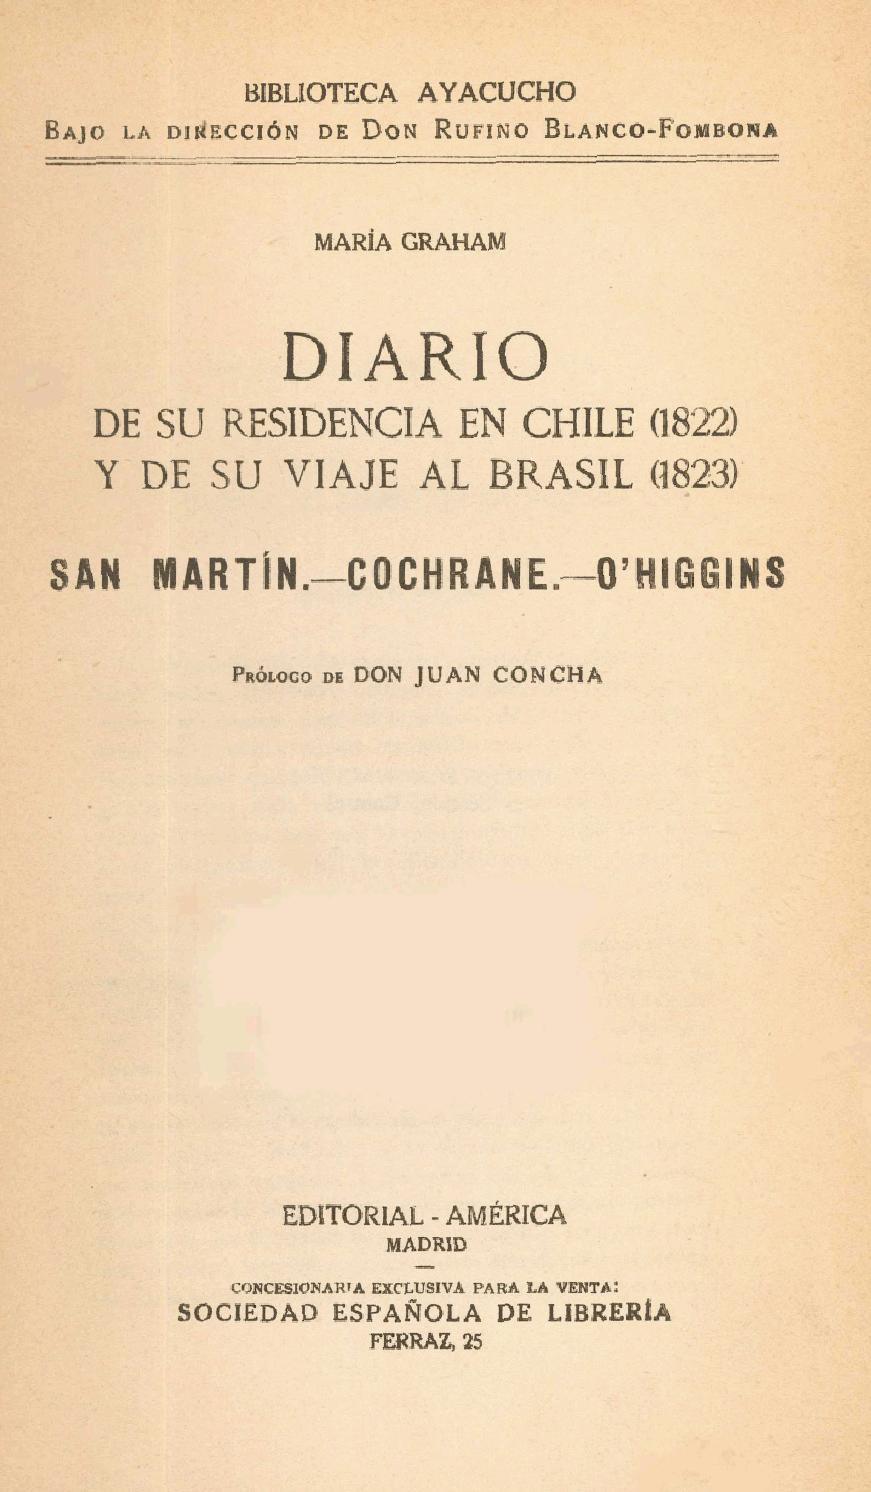 Maria graham by Jaime Morera Falcone - issuu